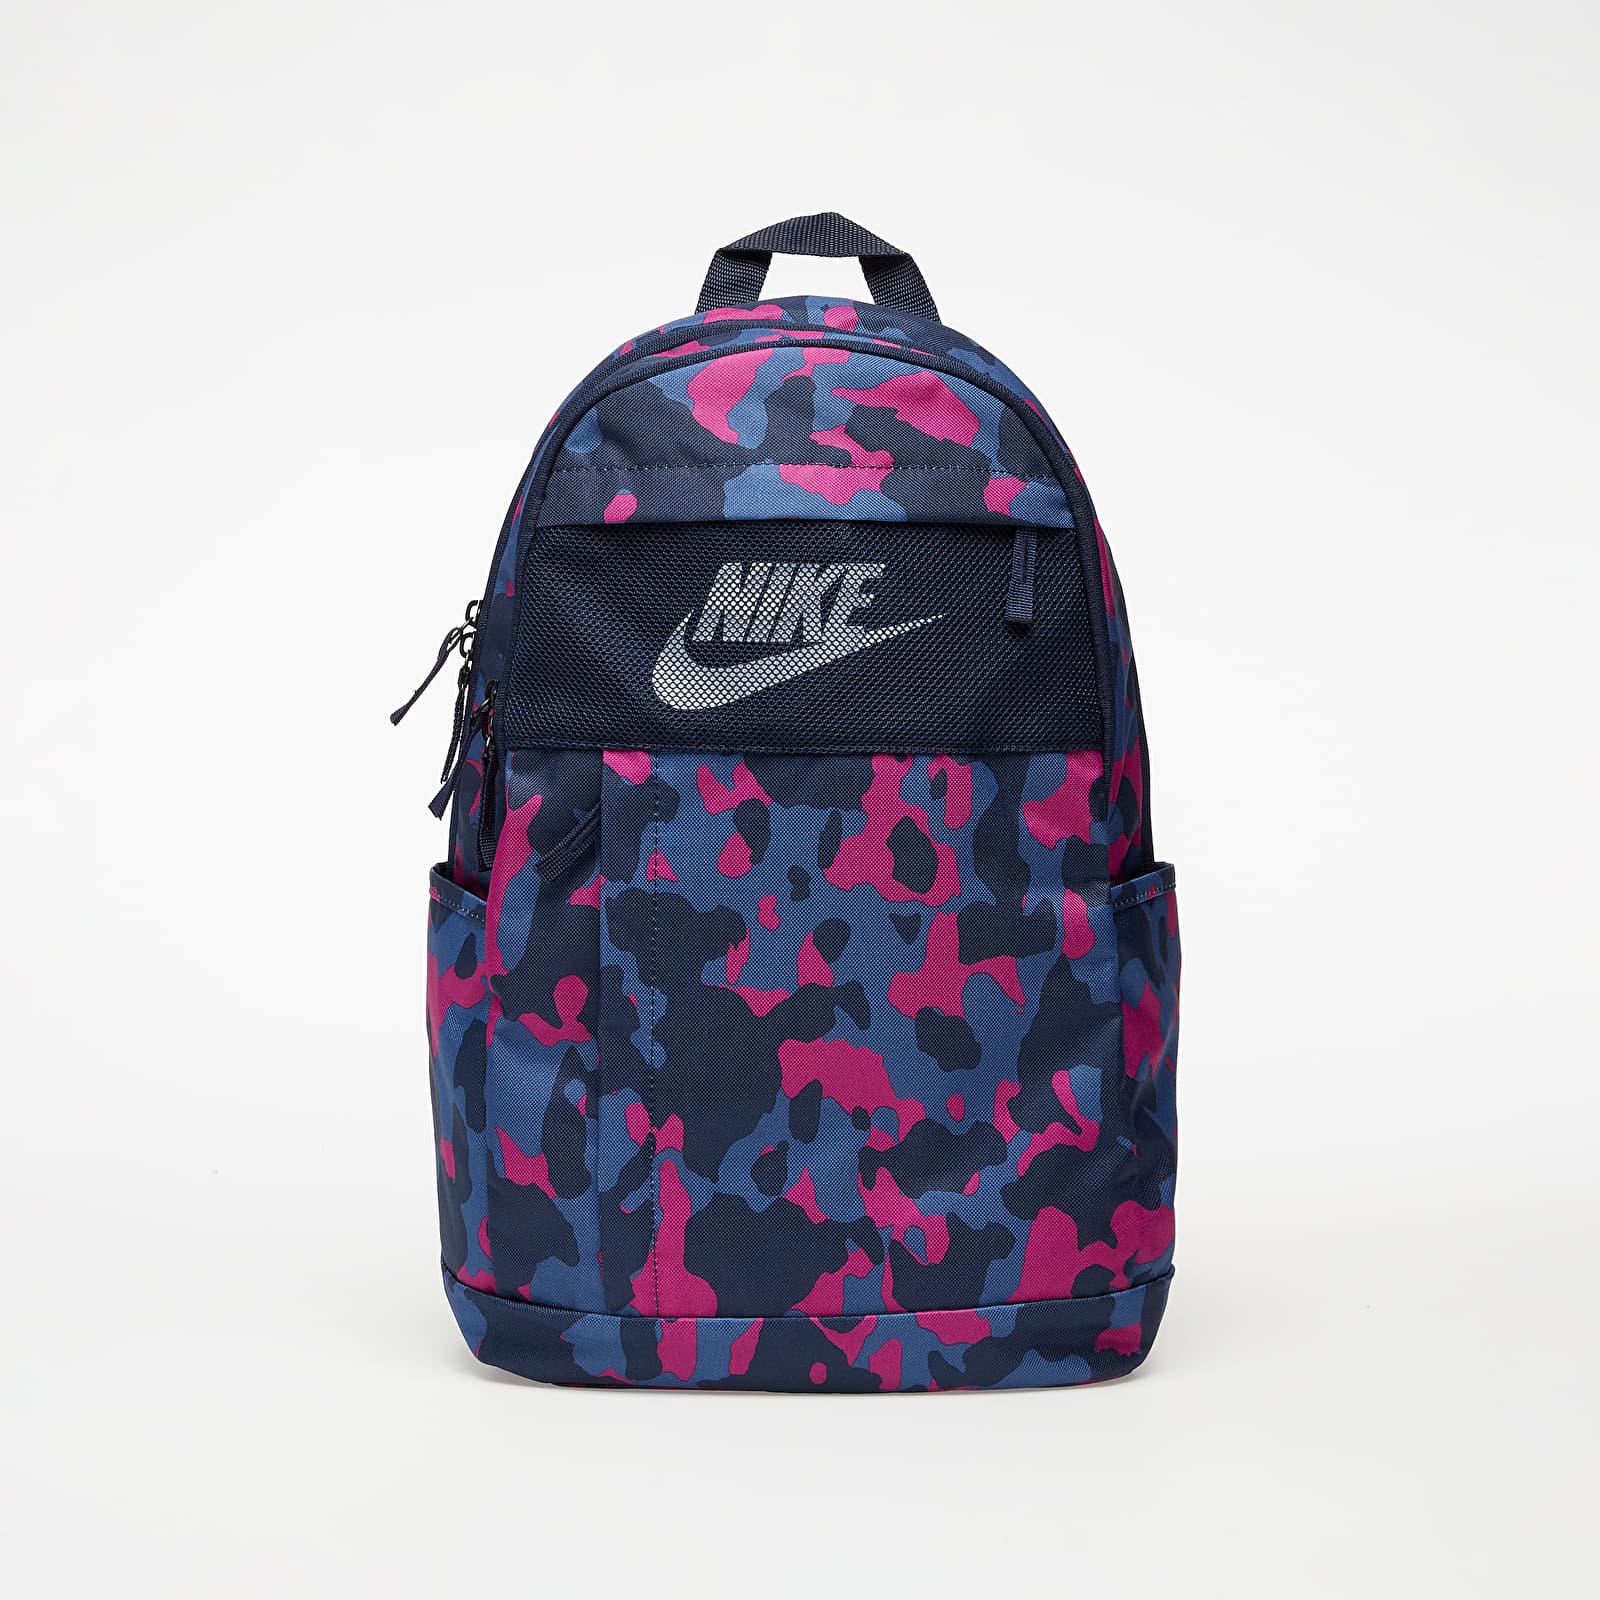 Rucksäcke Nike Elemental 2.0 Printed Backpack Obsidian/ Obsidian/ White